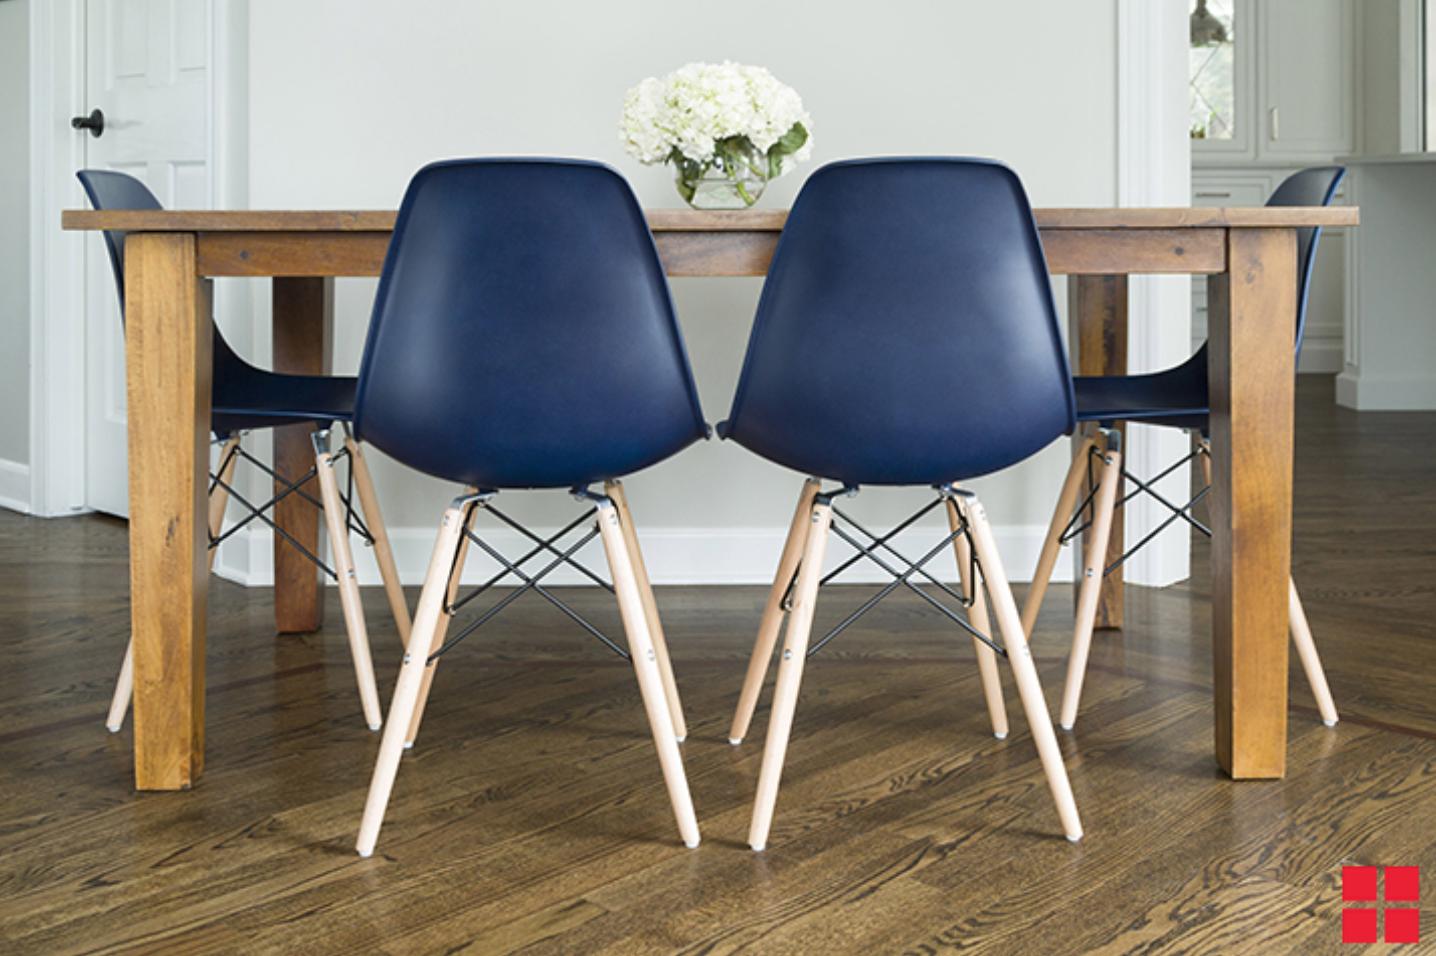 Rust - Chairs